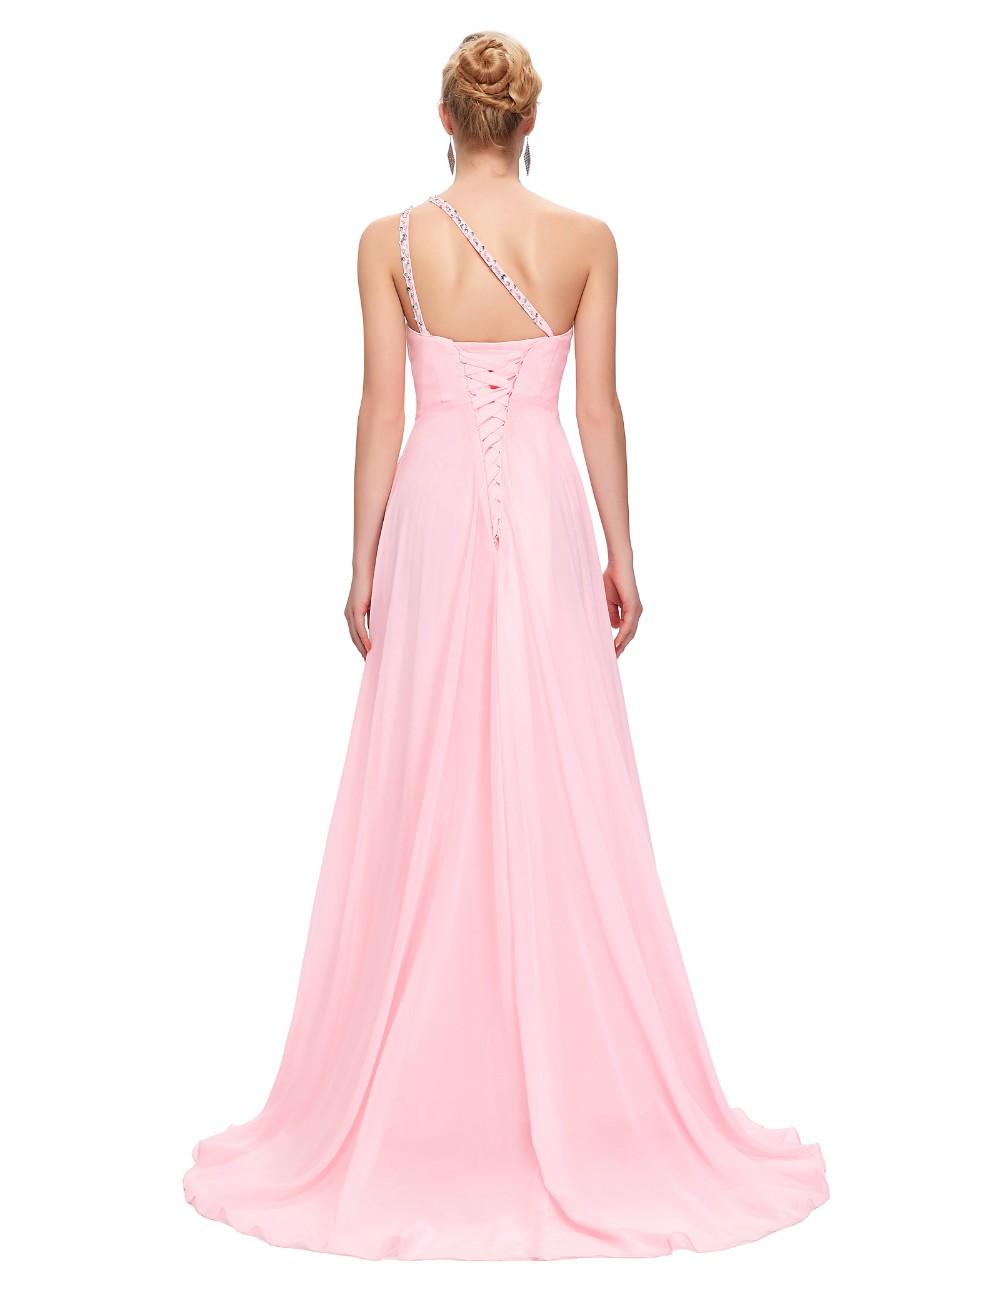 Modest barato Vestidos de dama de honor Bajo 50, gasa un hombro Rosa ...